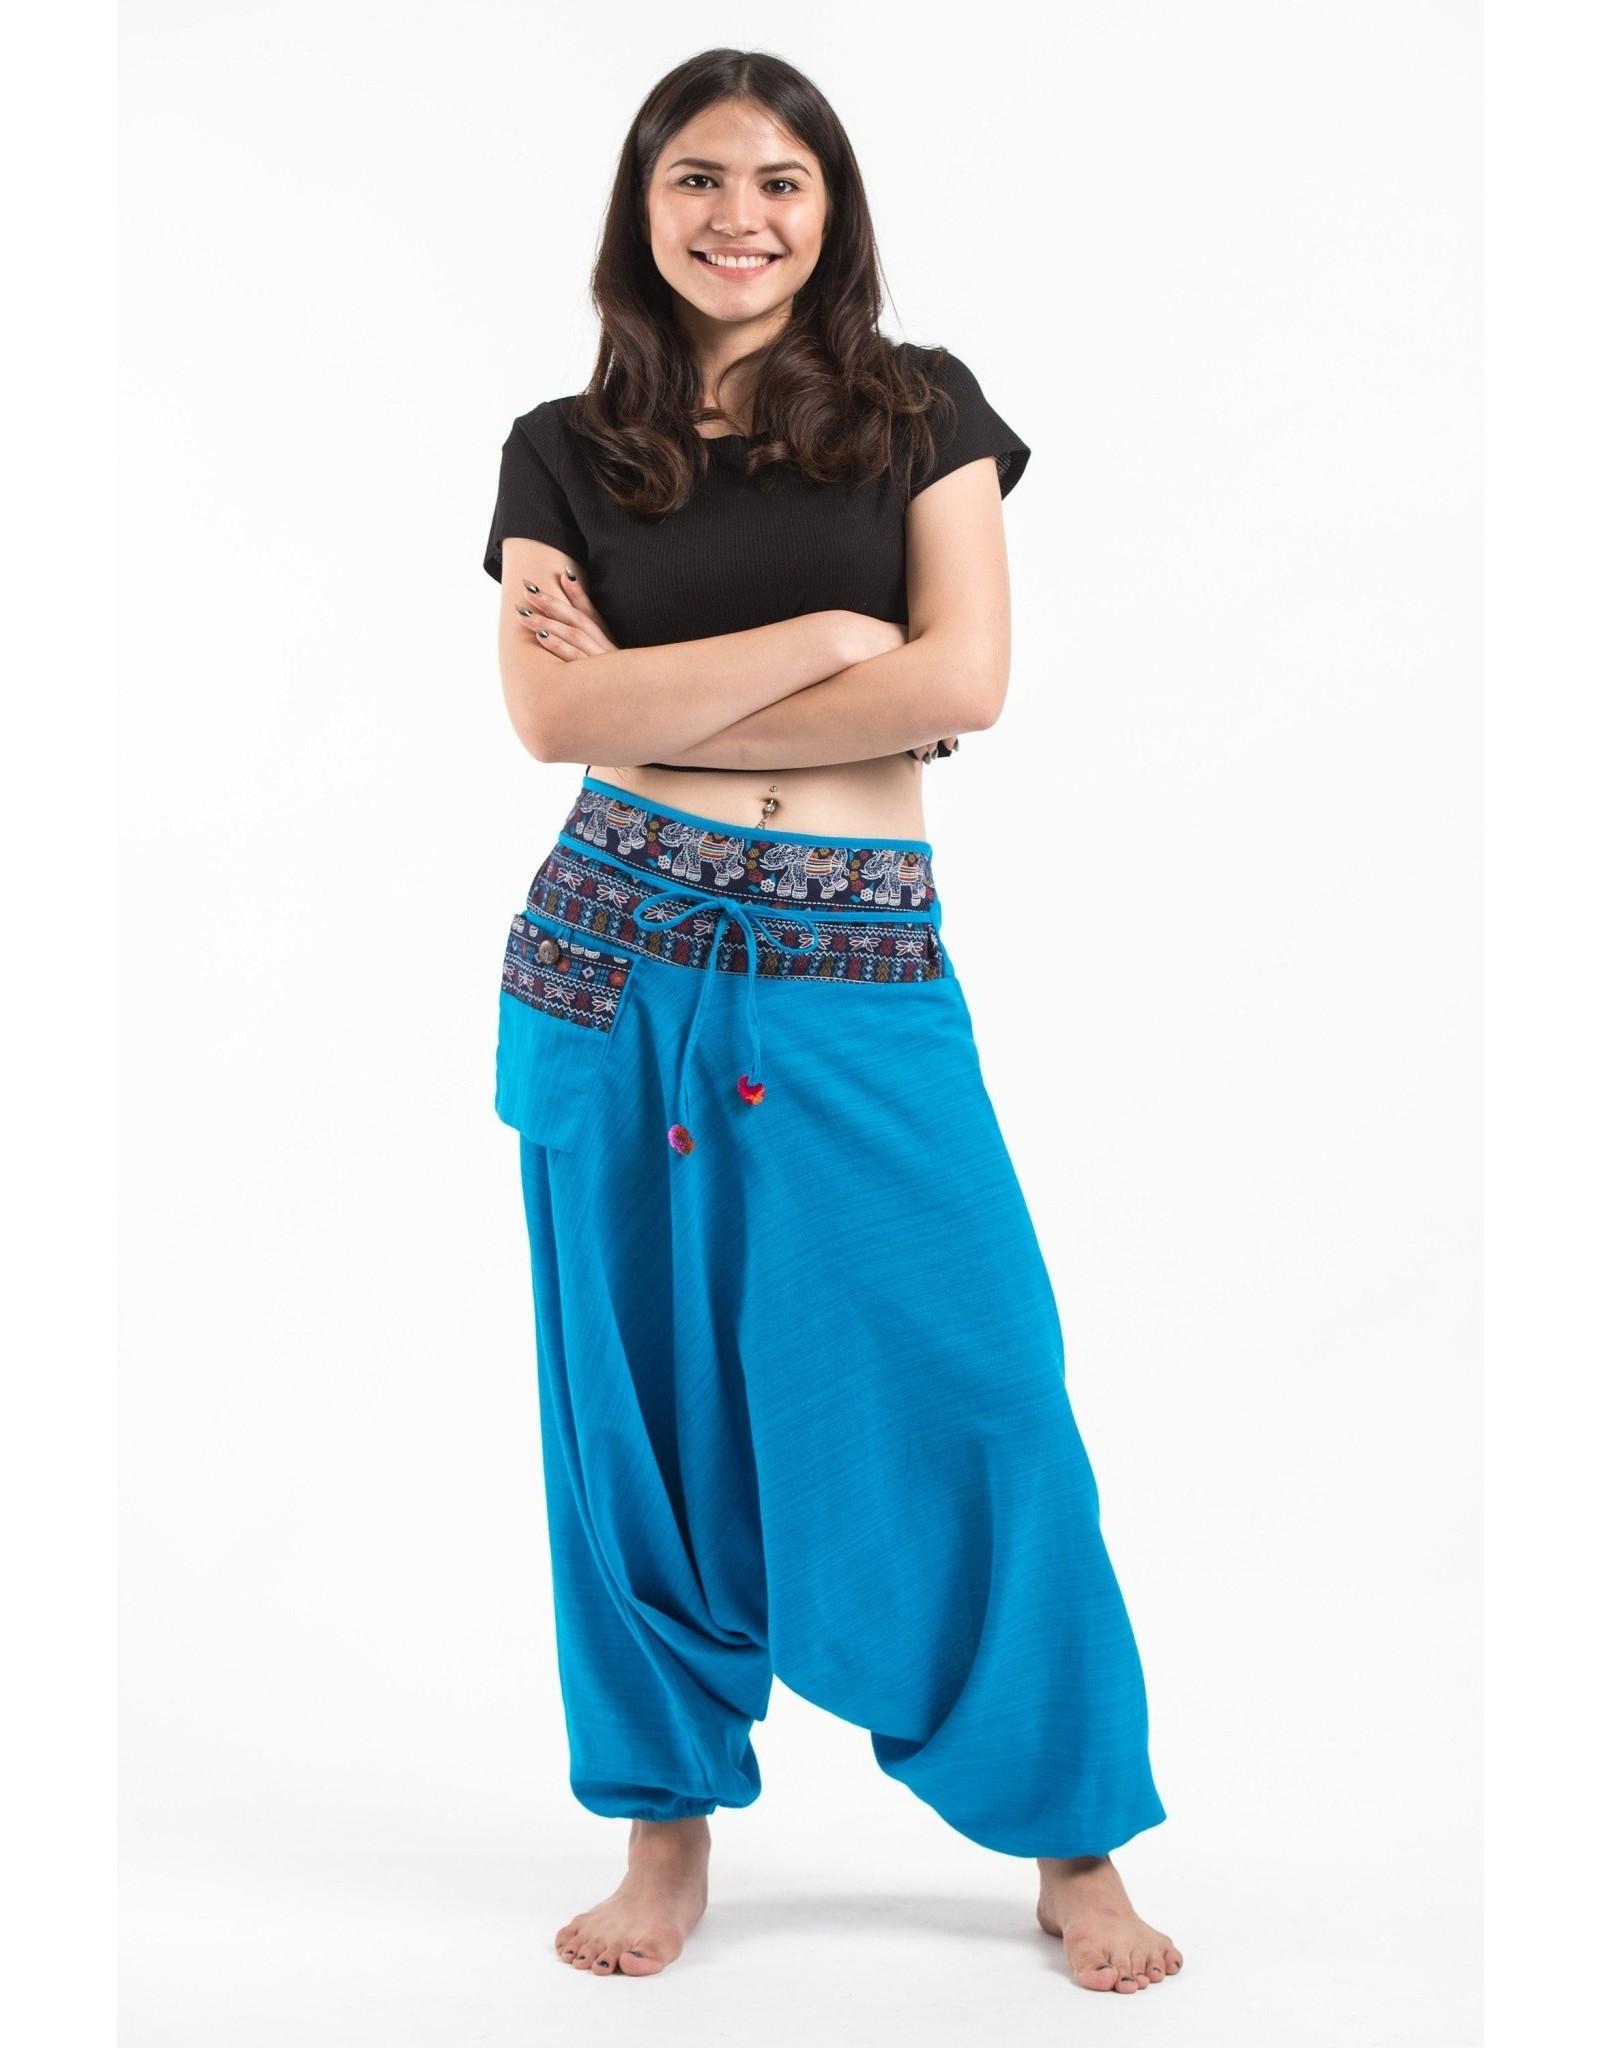 Tribal Top, Low Crotch Harem Pin Stripe Pants, Teal